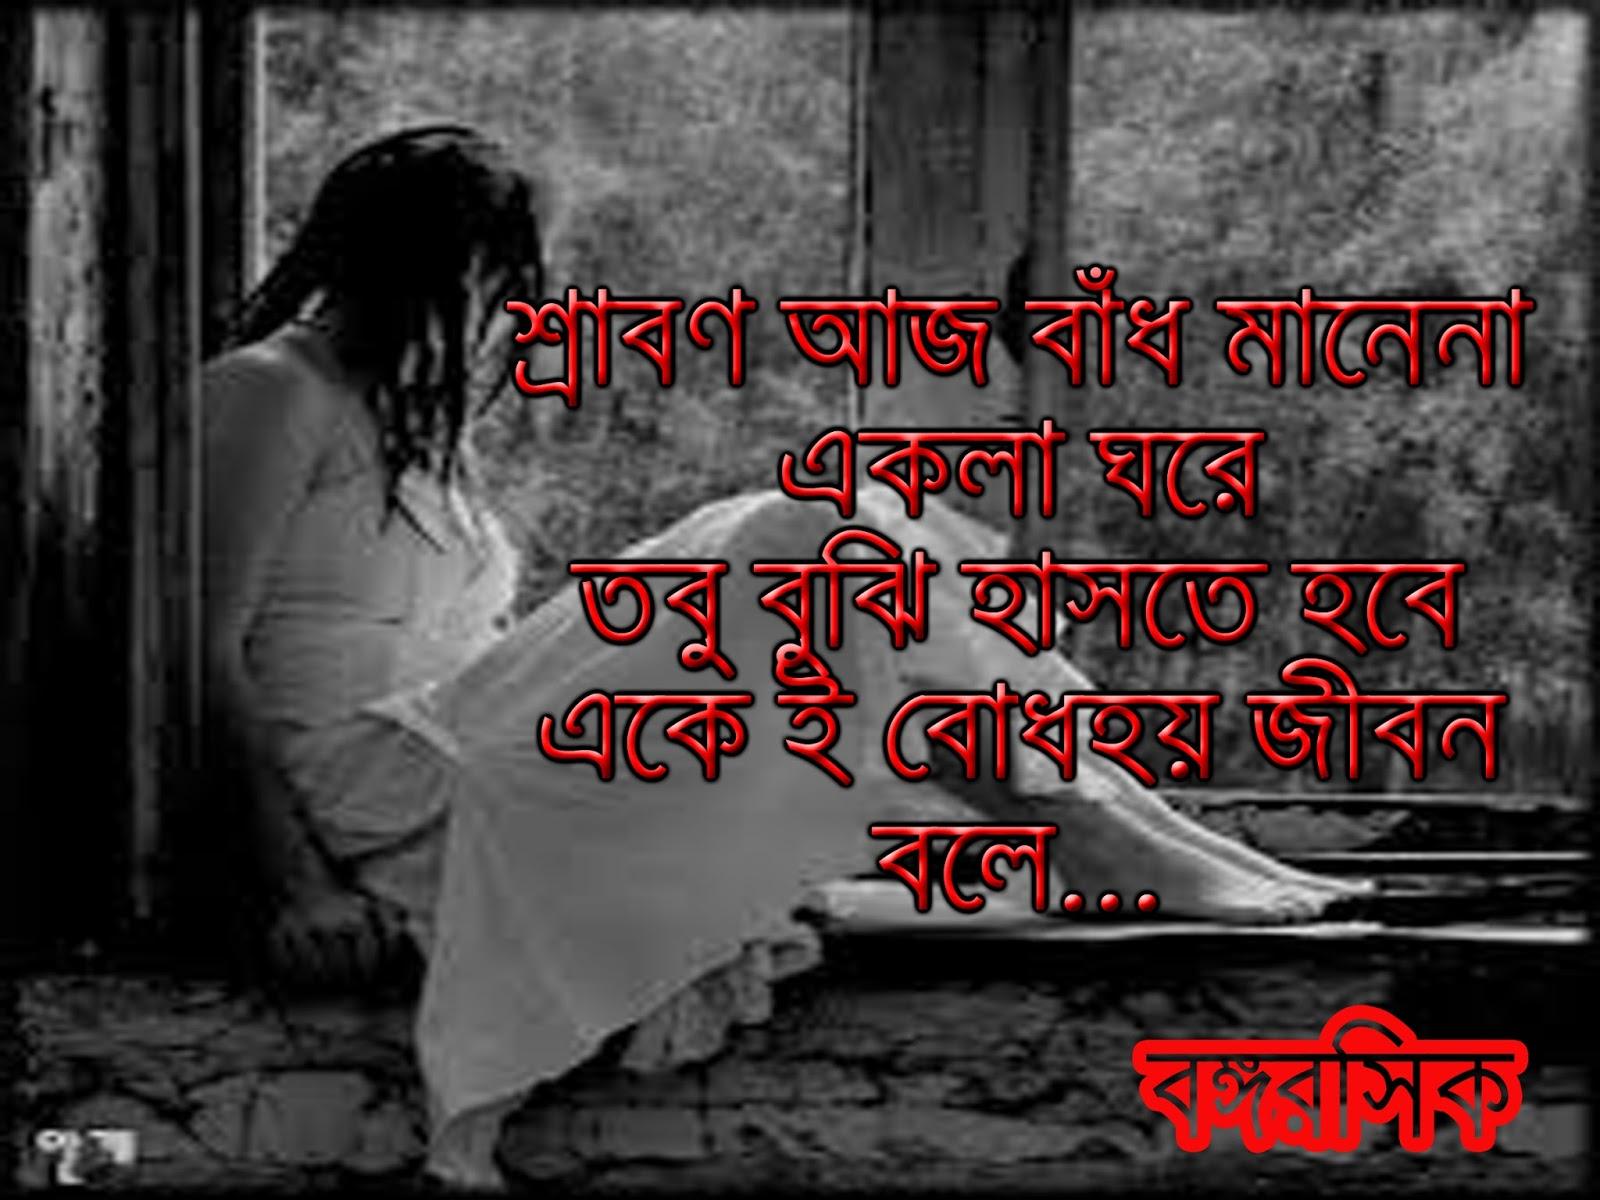 Bongorosik - Bengali quotes   bengali jokes   bangla kobita